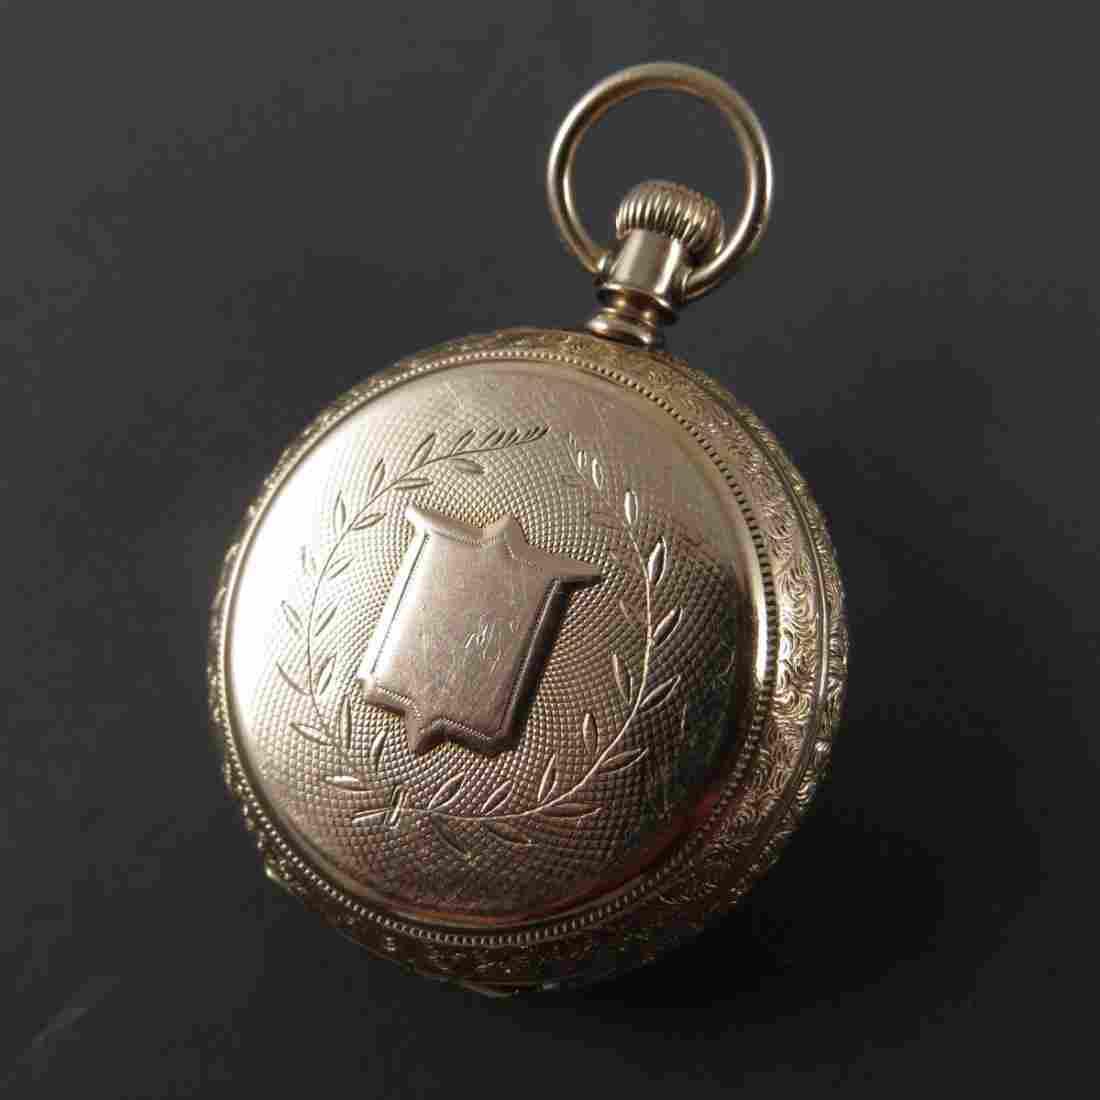 A.W. & Co Waltham Lady's Rose Gold Pocket Watch